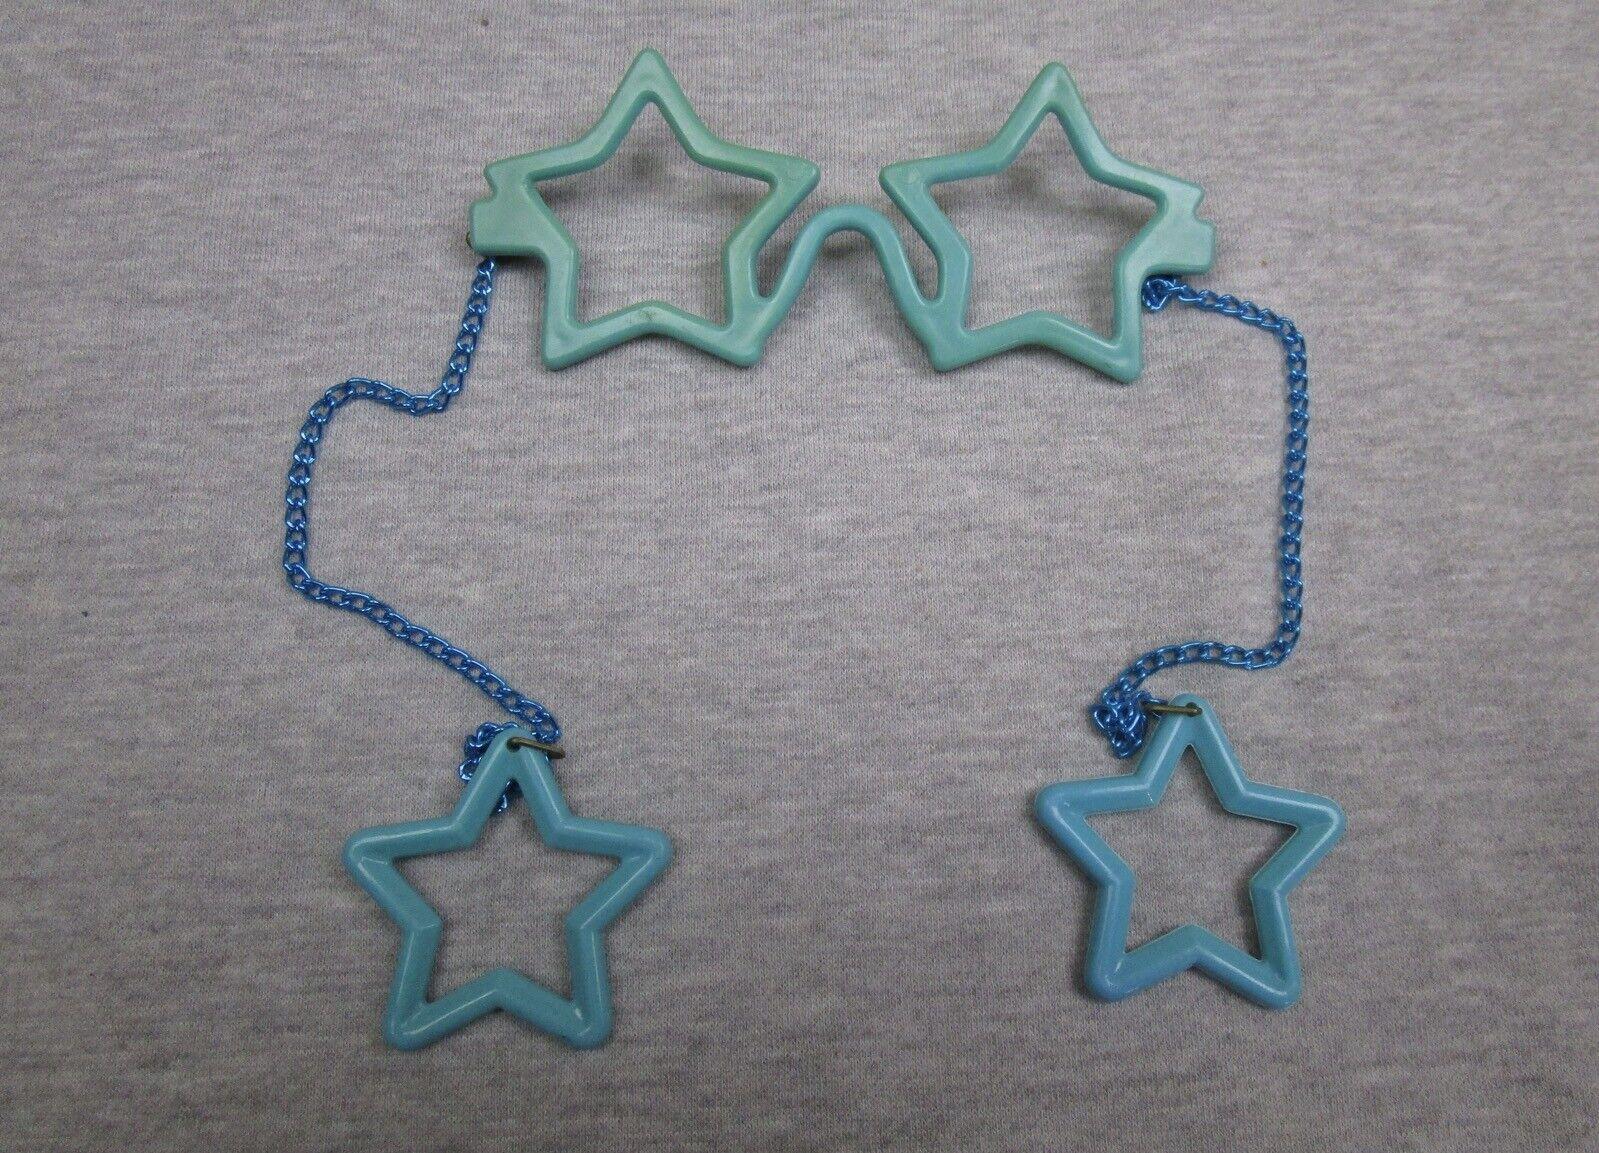 Vintage Kids Plastic Star Shaped Novelty Glasses and Star Earrings